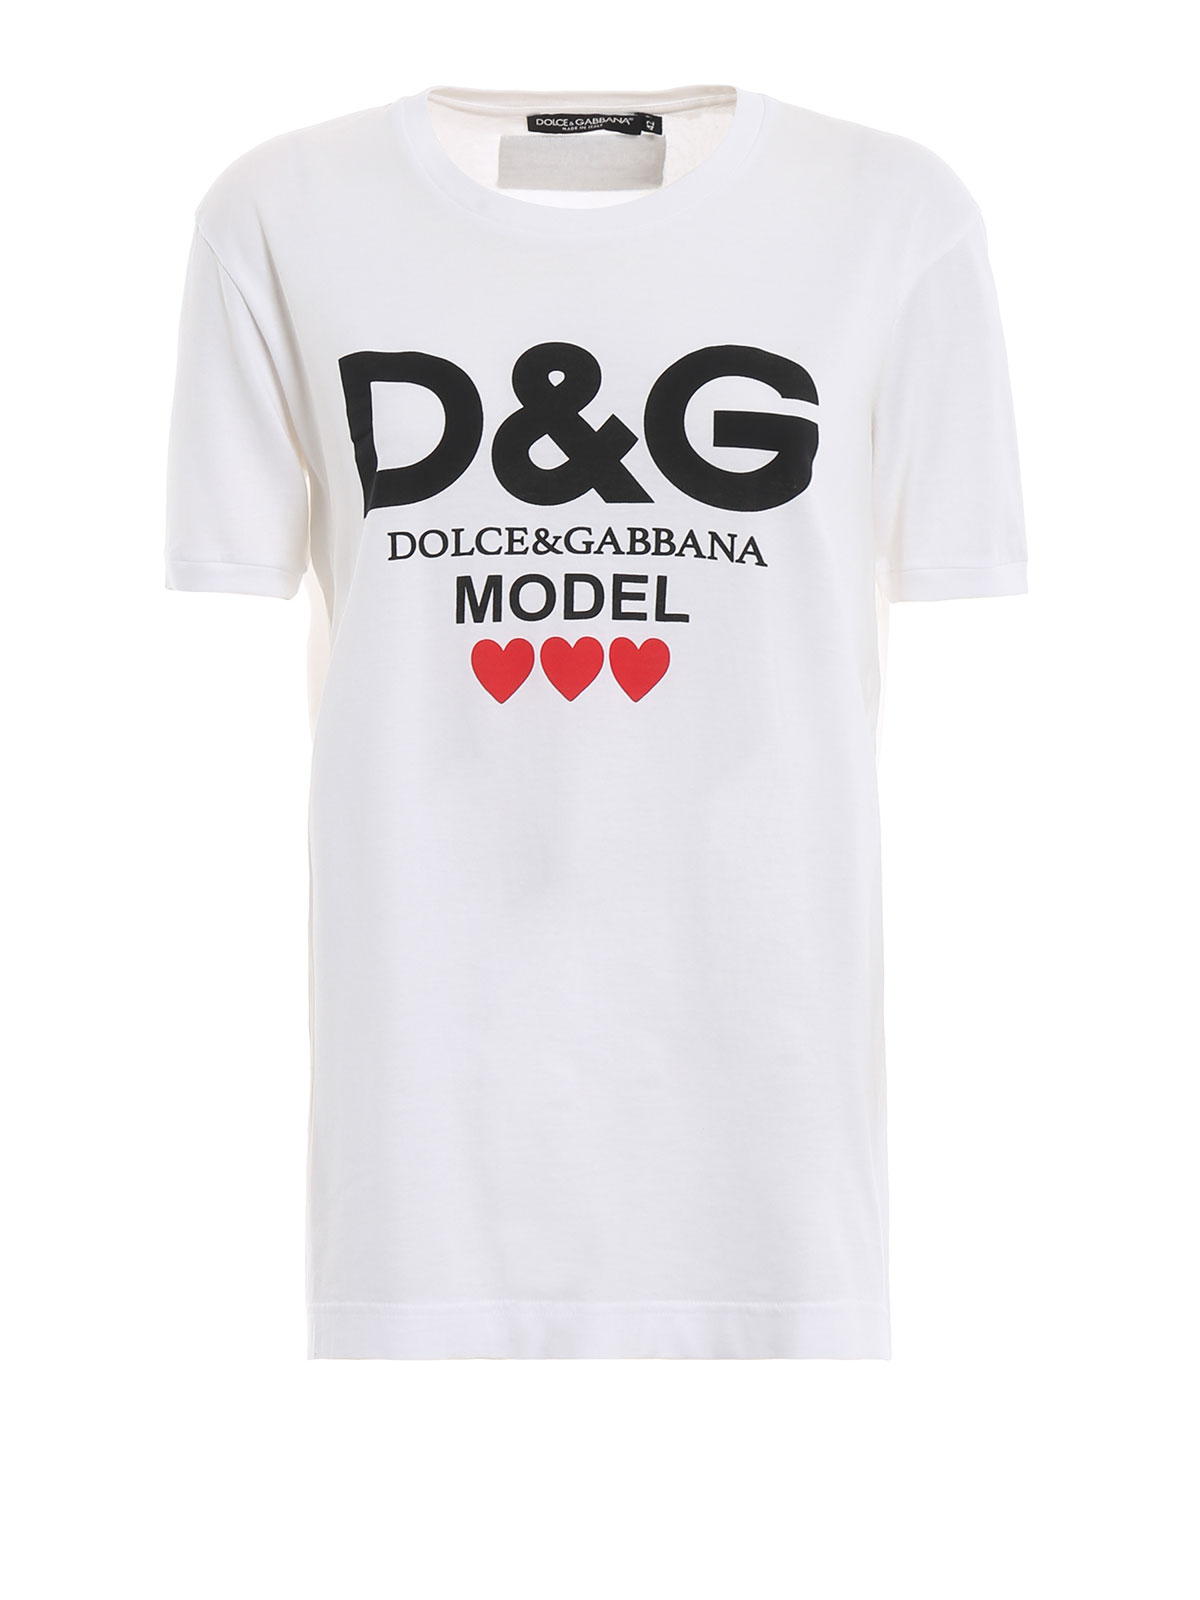 ec9f4e45126 Dolce   Gabbana - D G Model print white cotton T-shirt - t-shirts ...